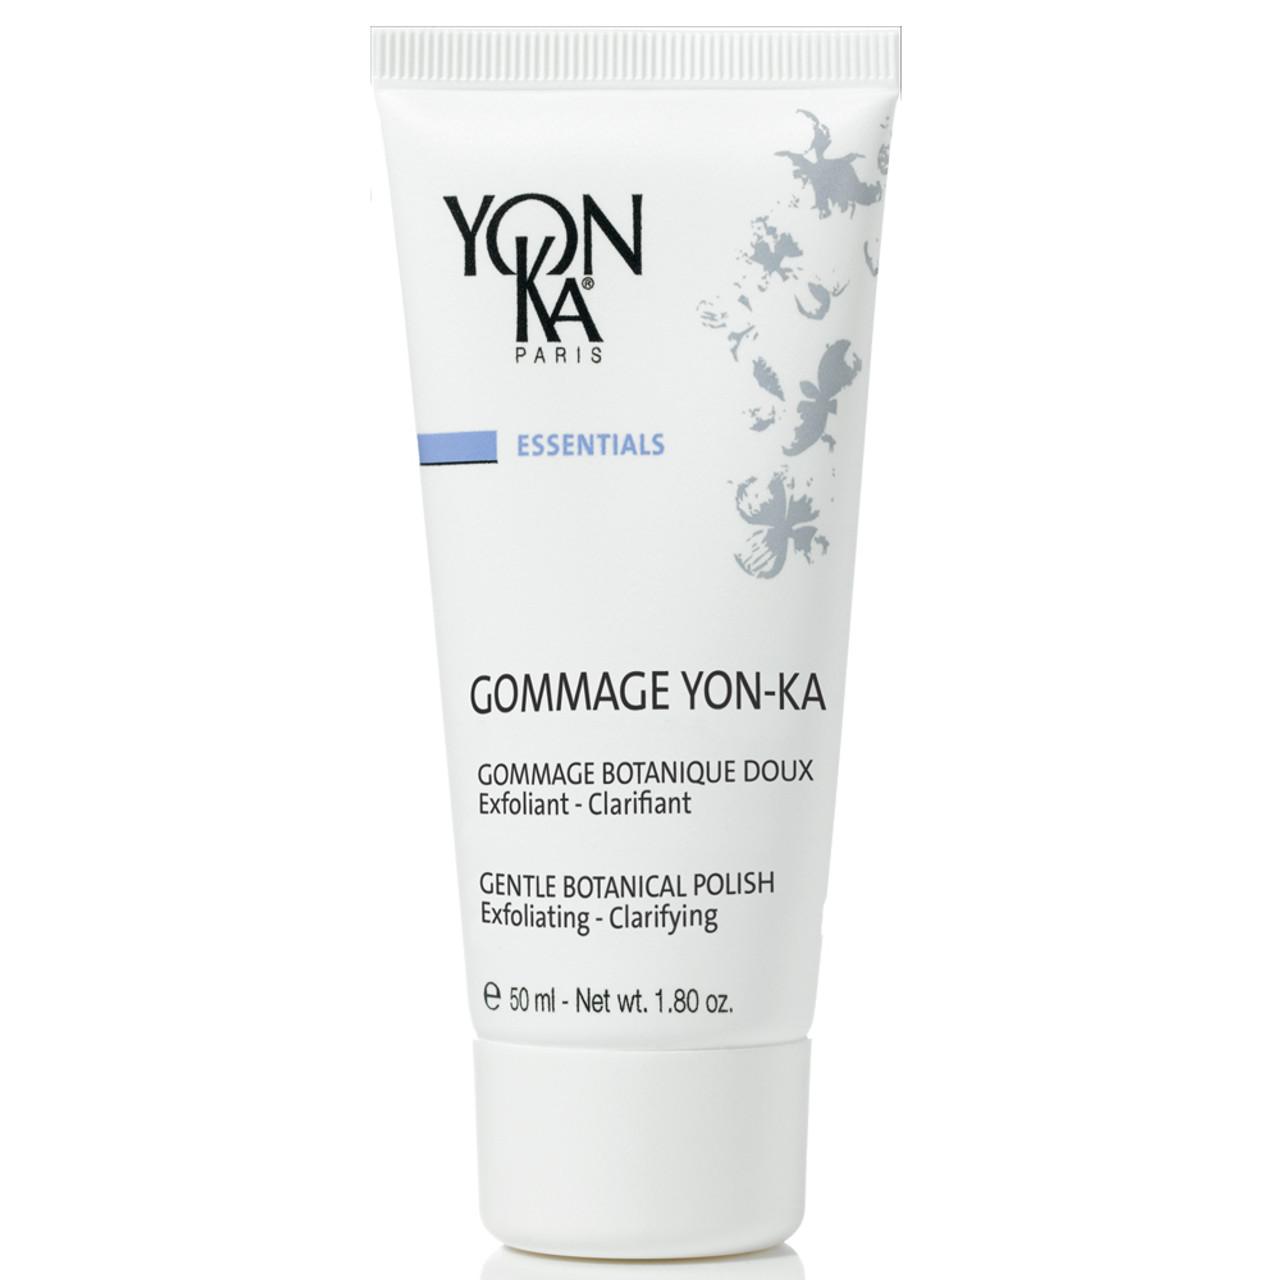 Yonka Gommage Yon-Ka Gentle Botanical Polish